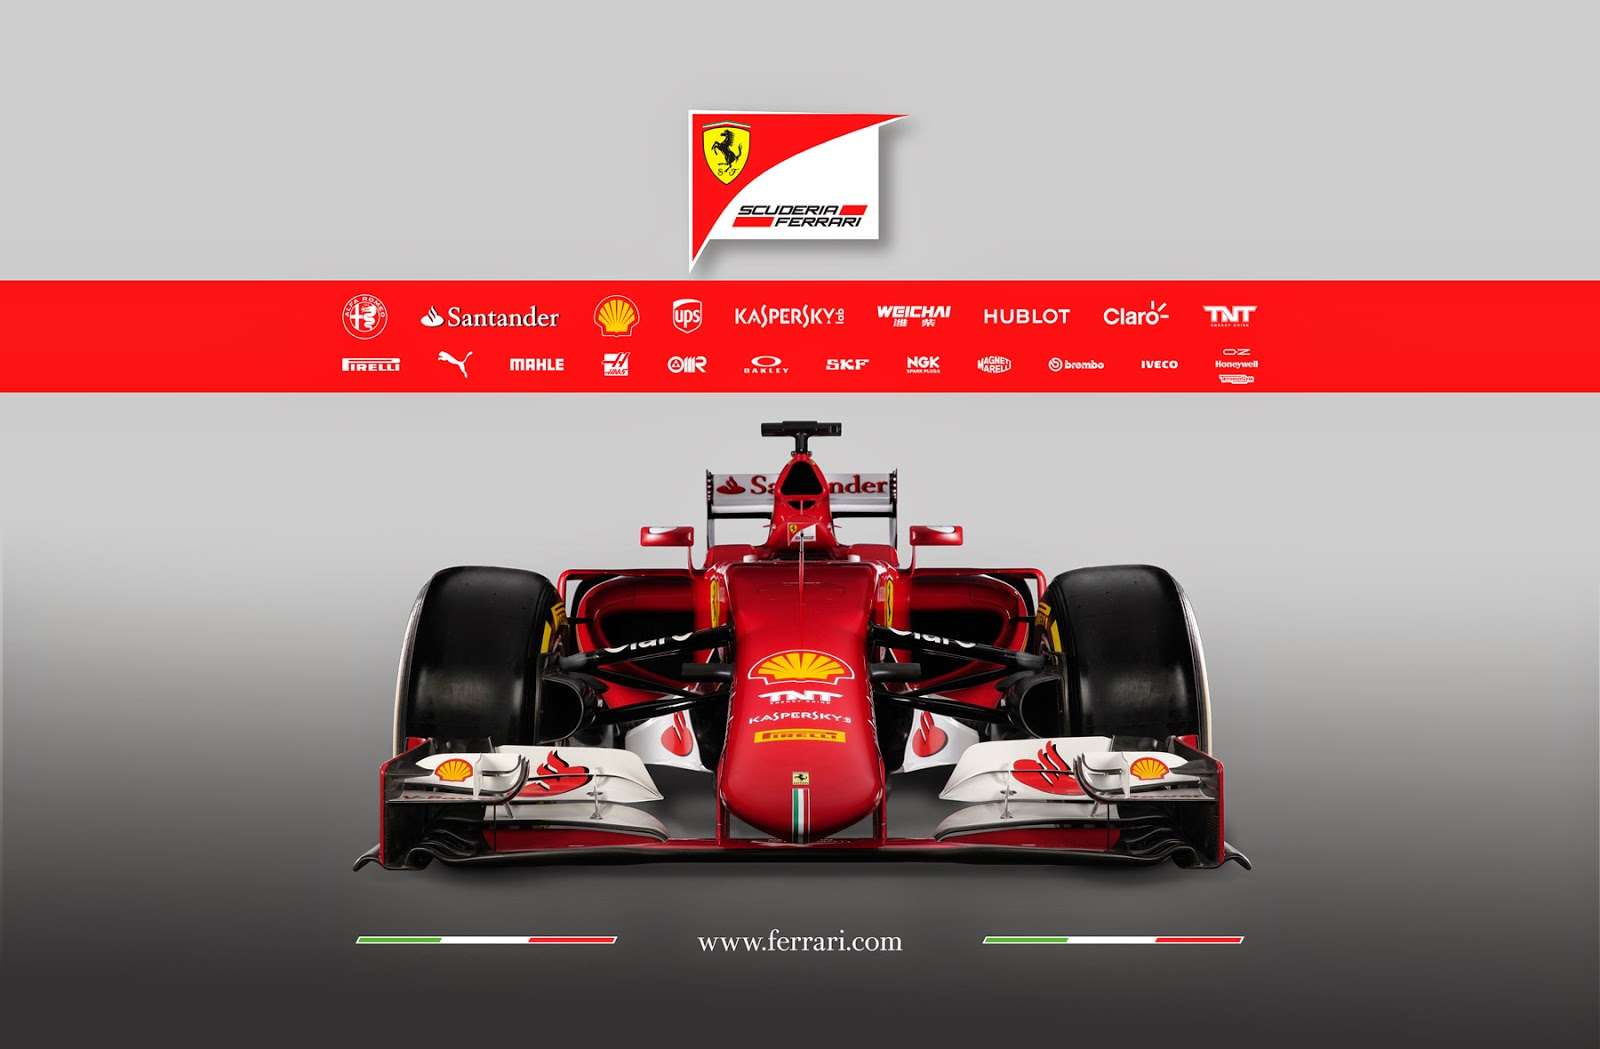 49 F1 2015 Wallpaper On Wallpapersafari